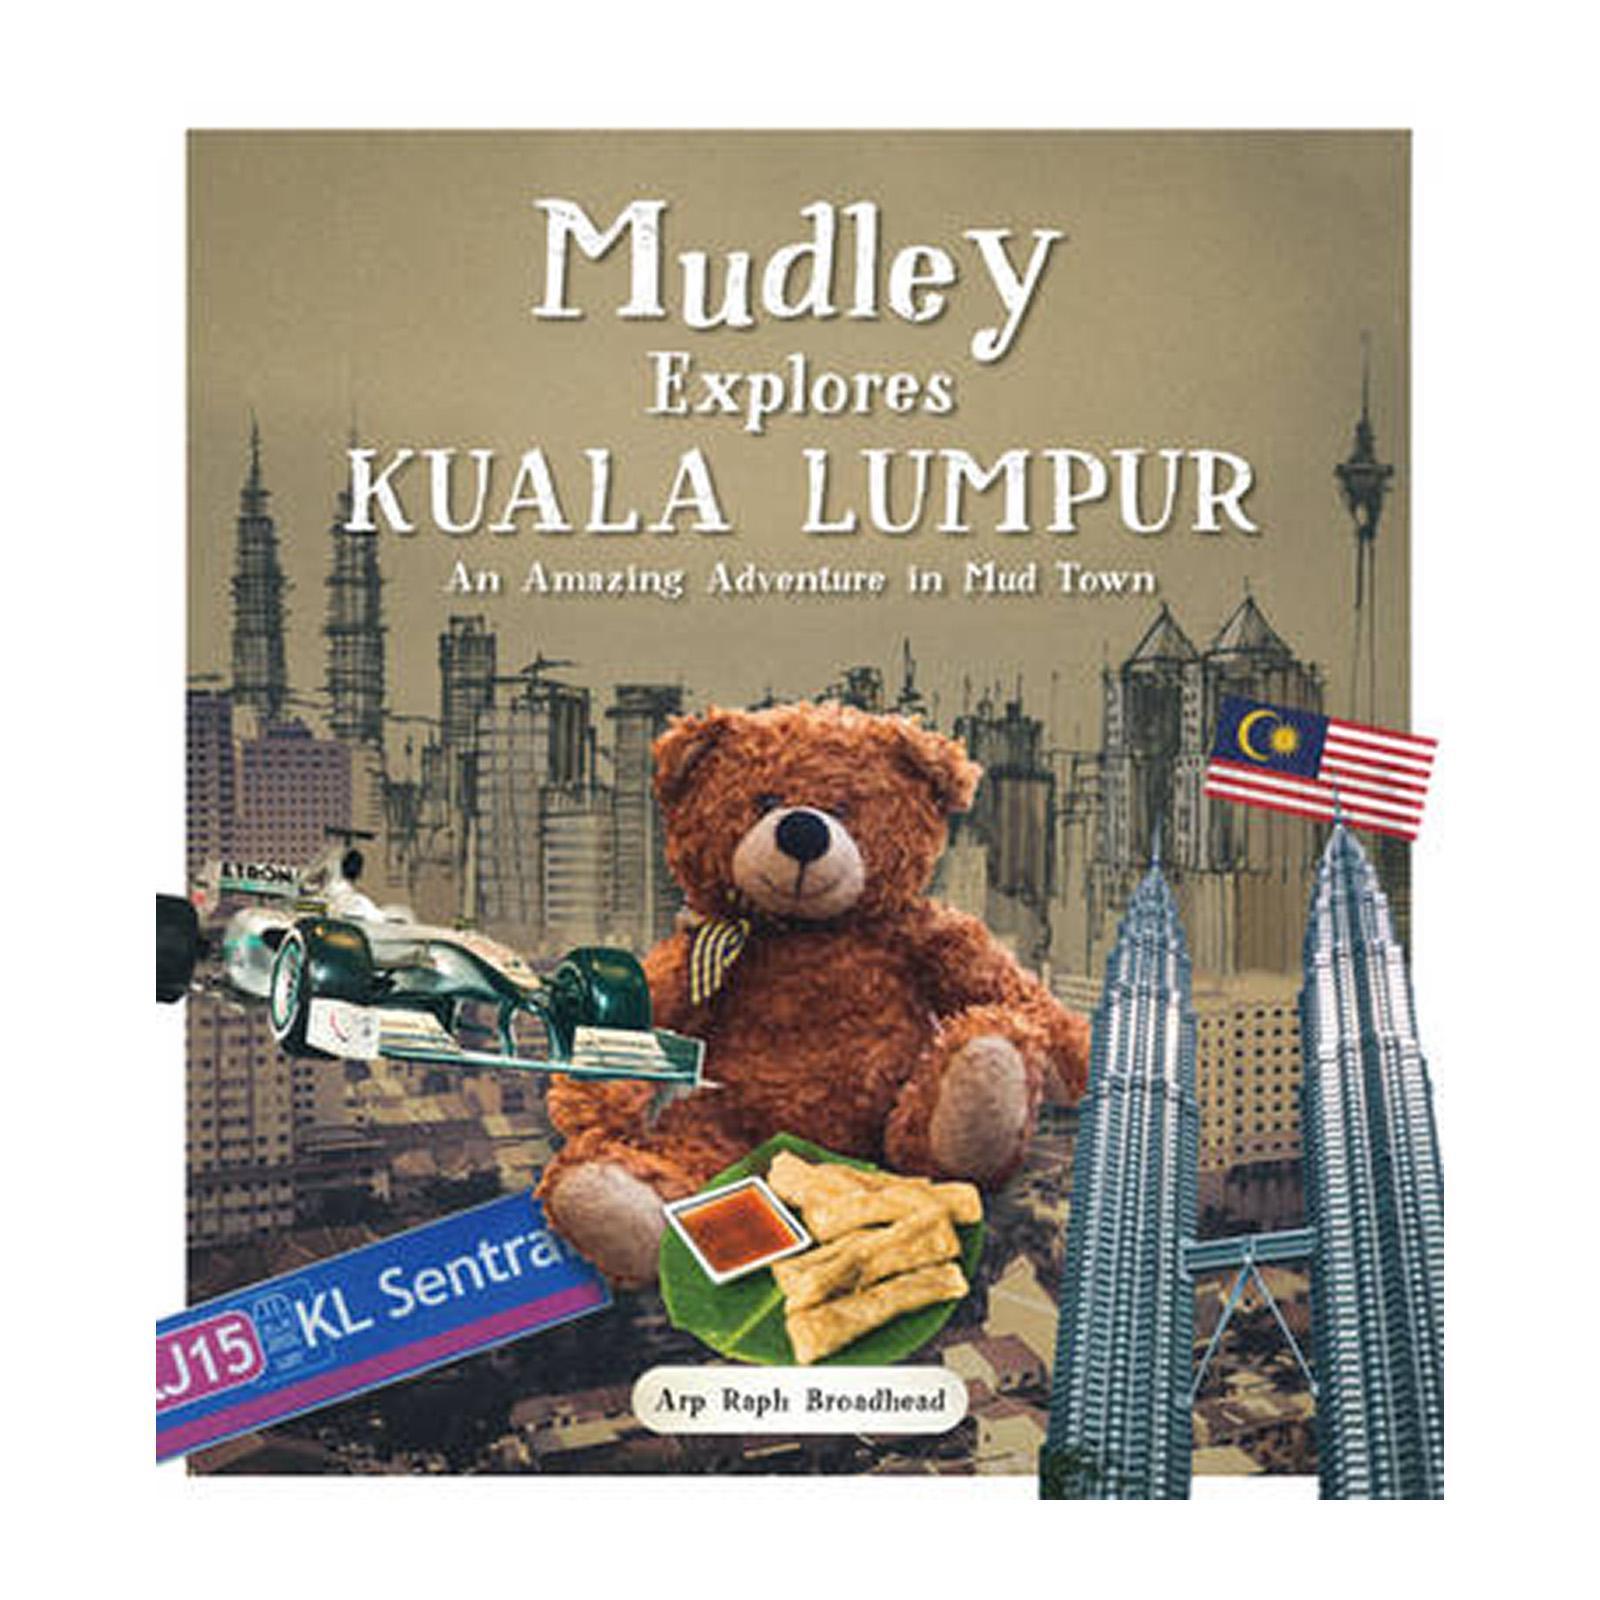 Mudley Explores Kuala Lumpur: An Amazing Adventure Into Mudtown (Paperback)